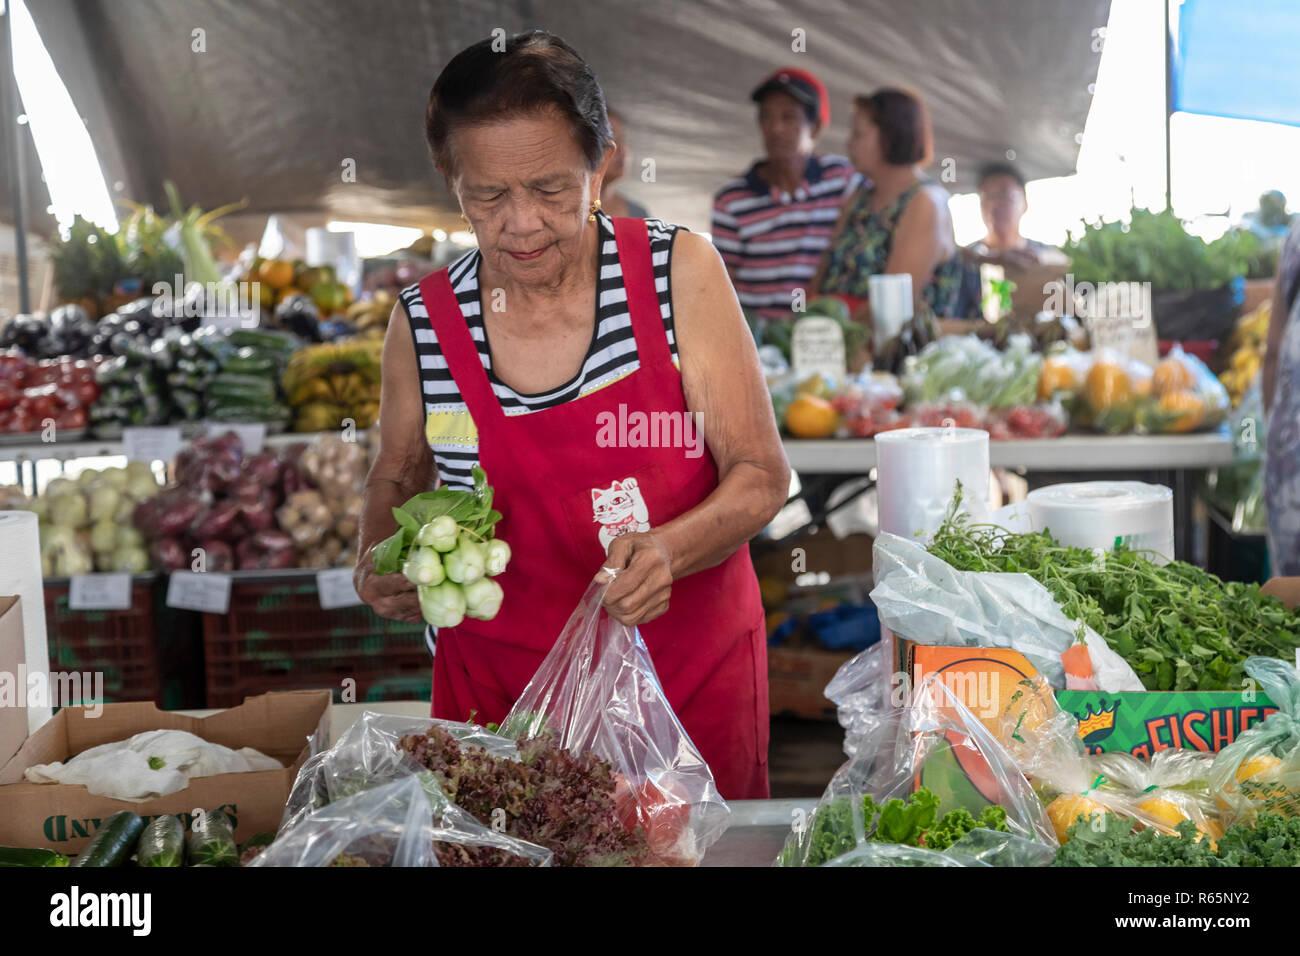 Hilo, Hawaii - The Hilo Farmers Market. - Stock Image